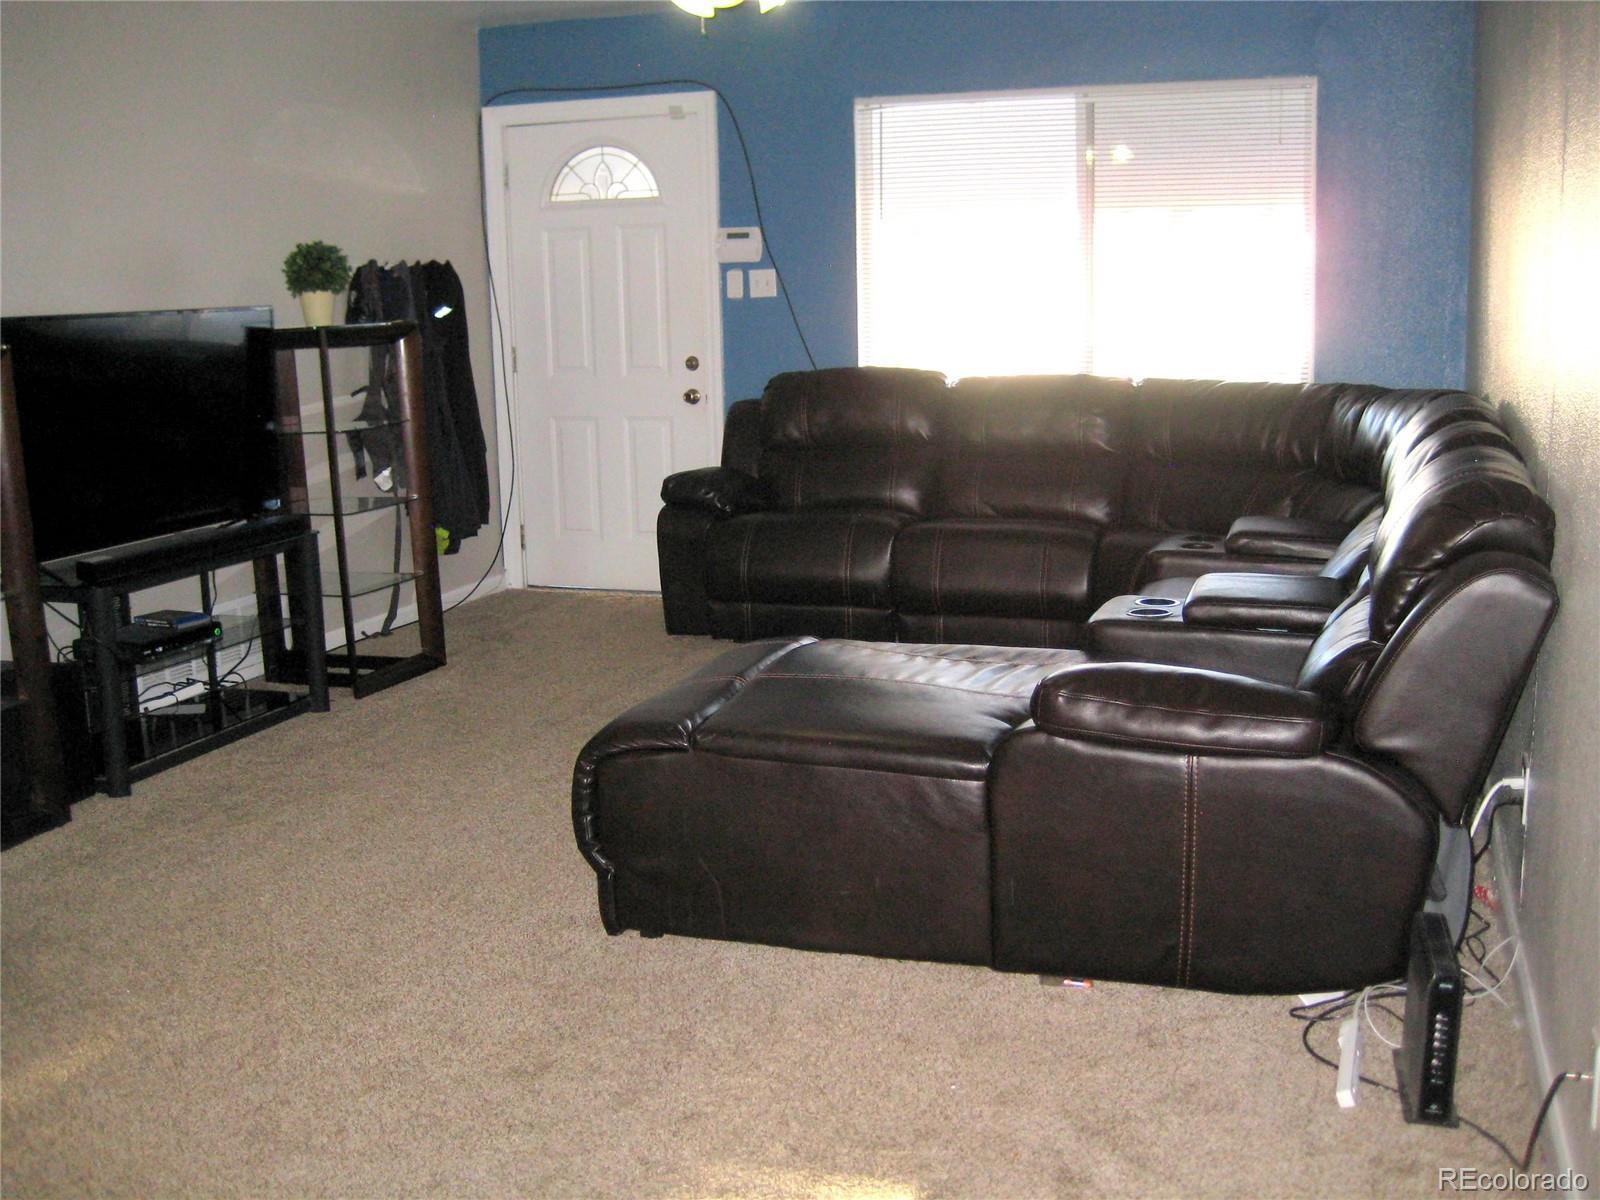 MLS# 8530466 - 8 - 957 Revere Street, Aurora, CO 80011